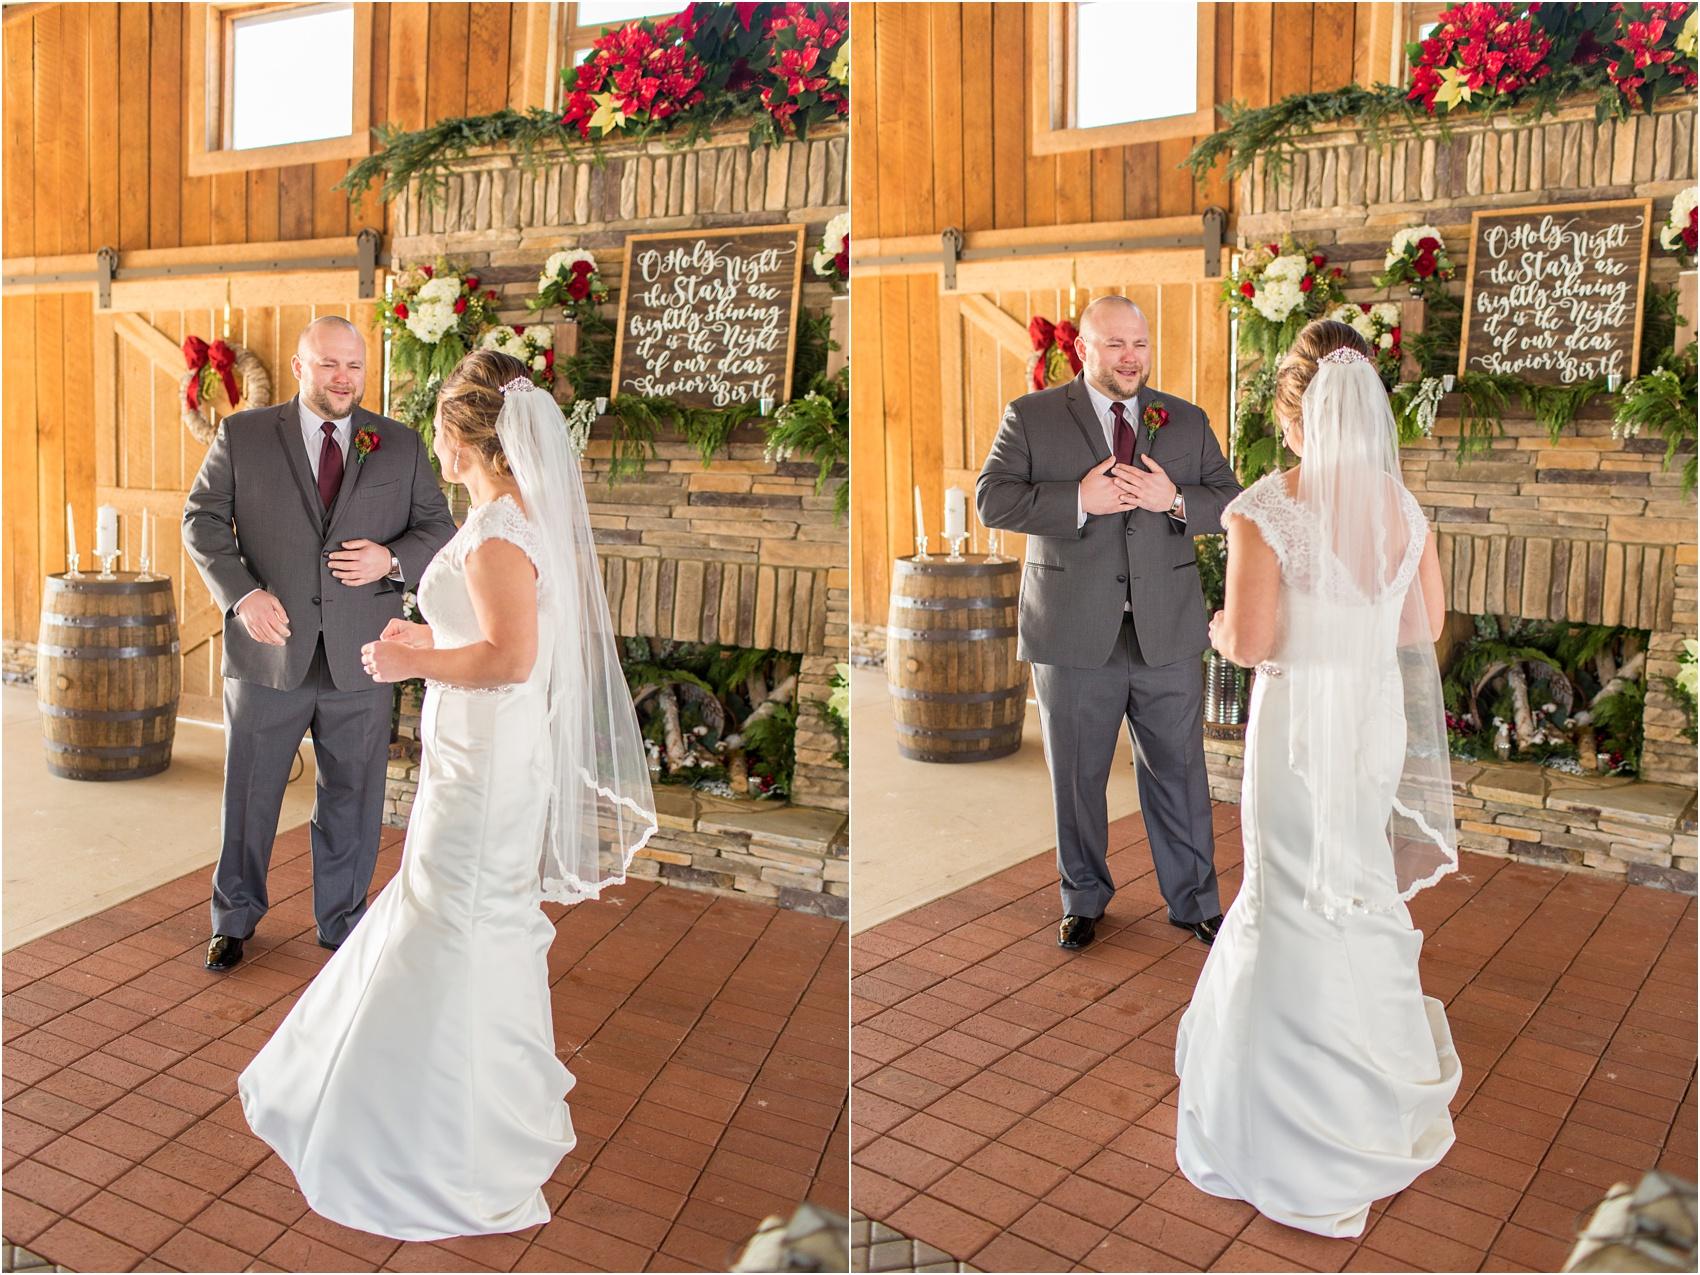 Savannah Eve Photography- Page Wedding Blog-27.jpg